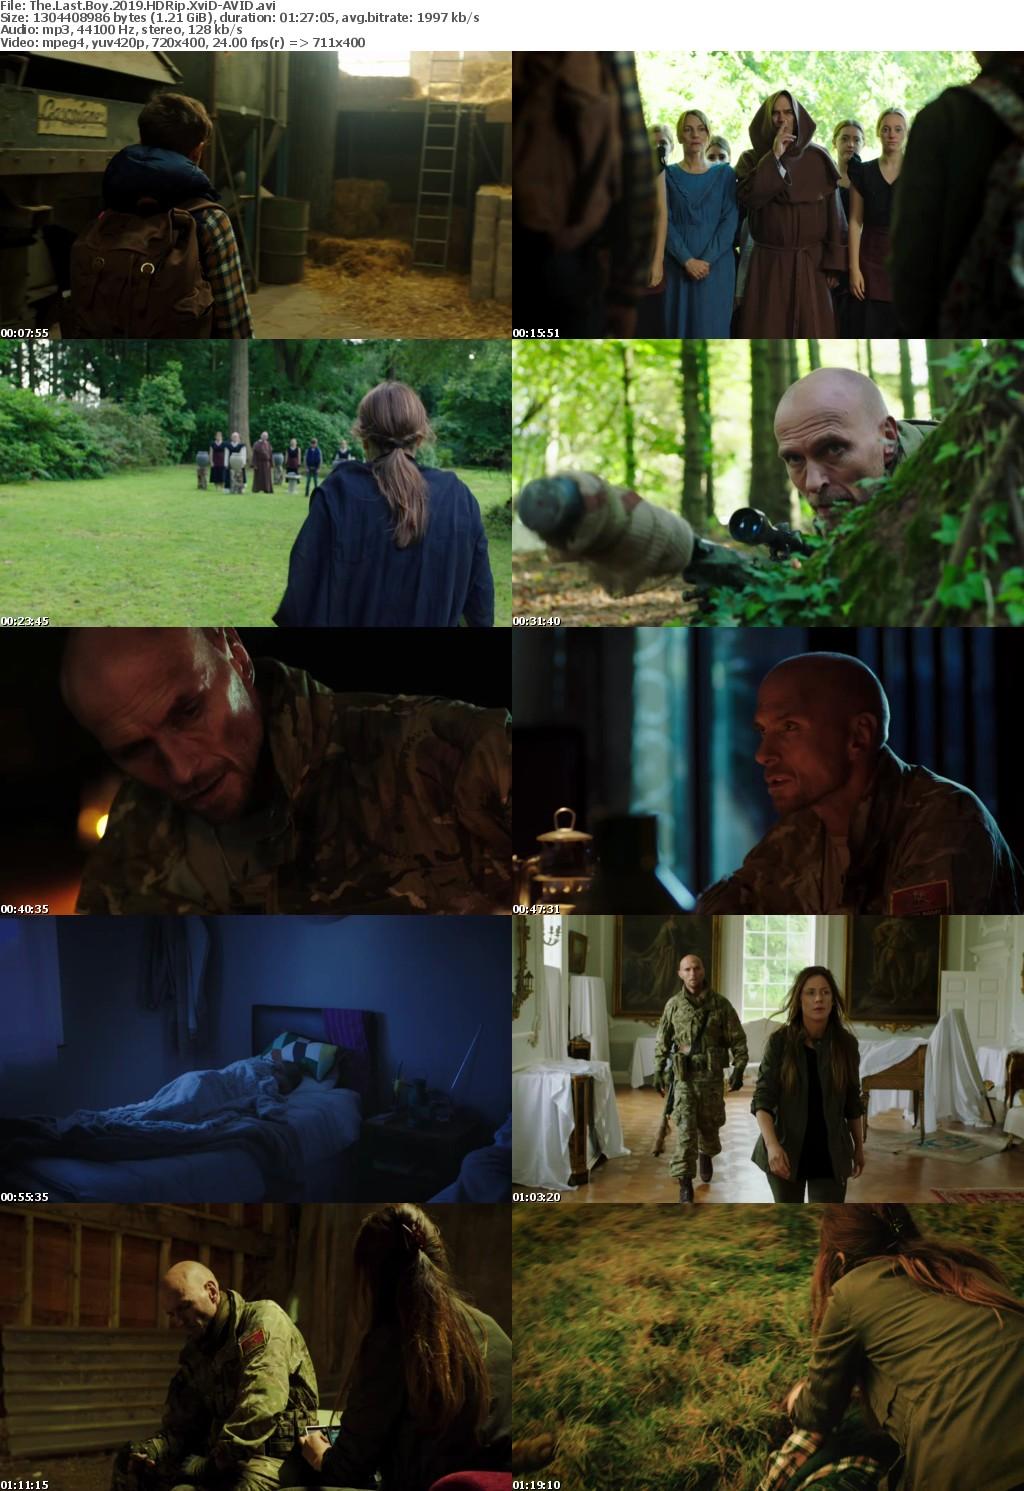 The Last Boy (2019) HDRip XviD-AVID